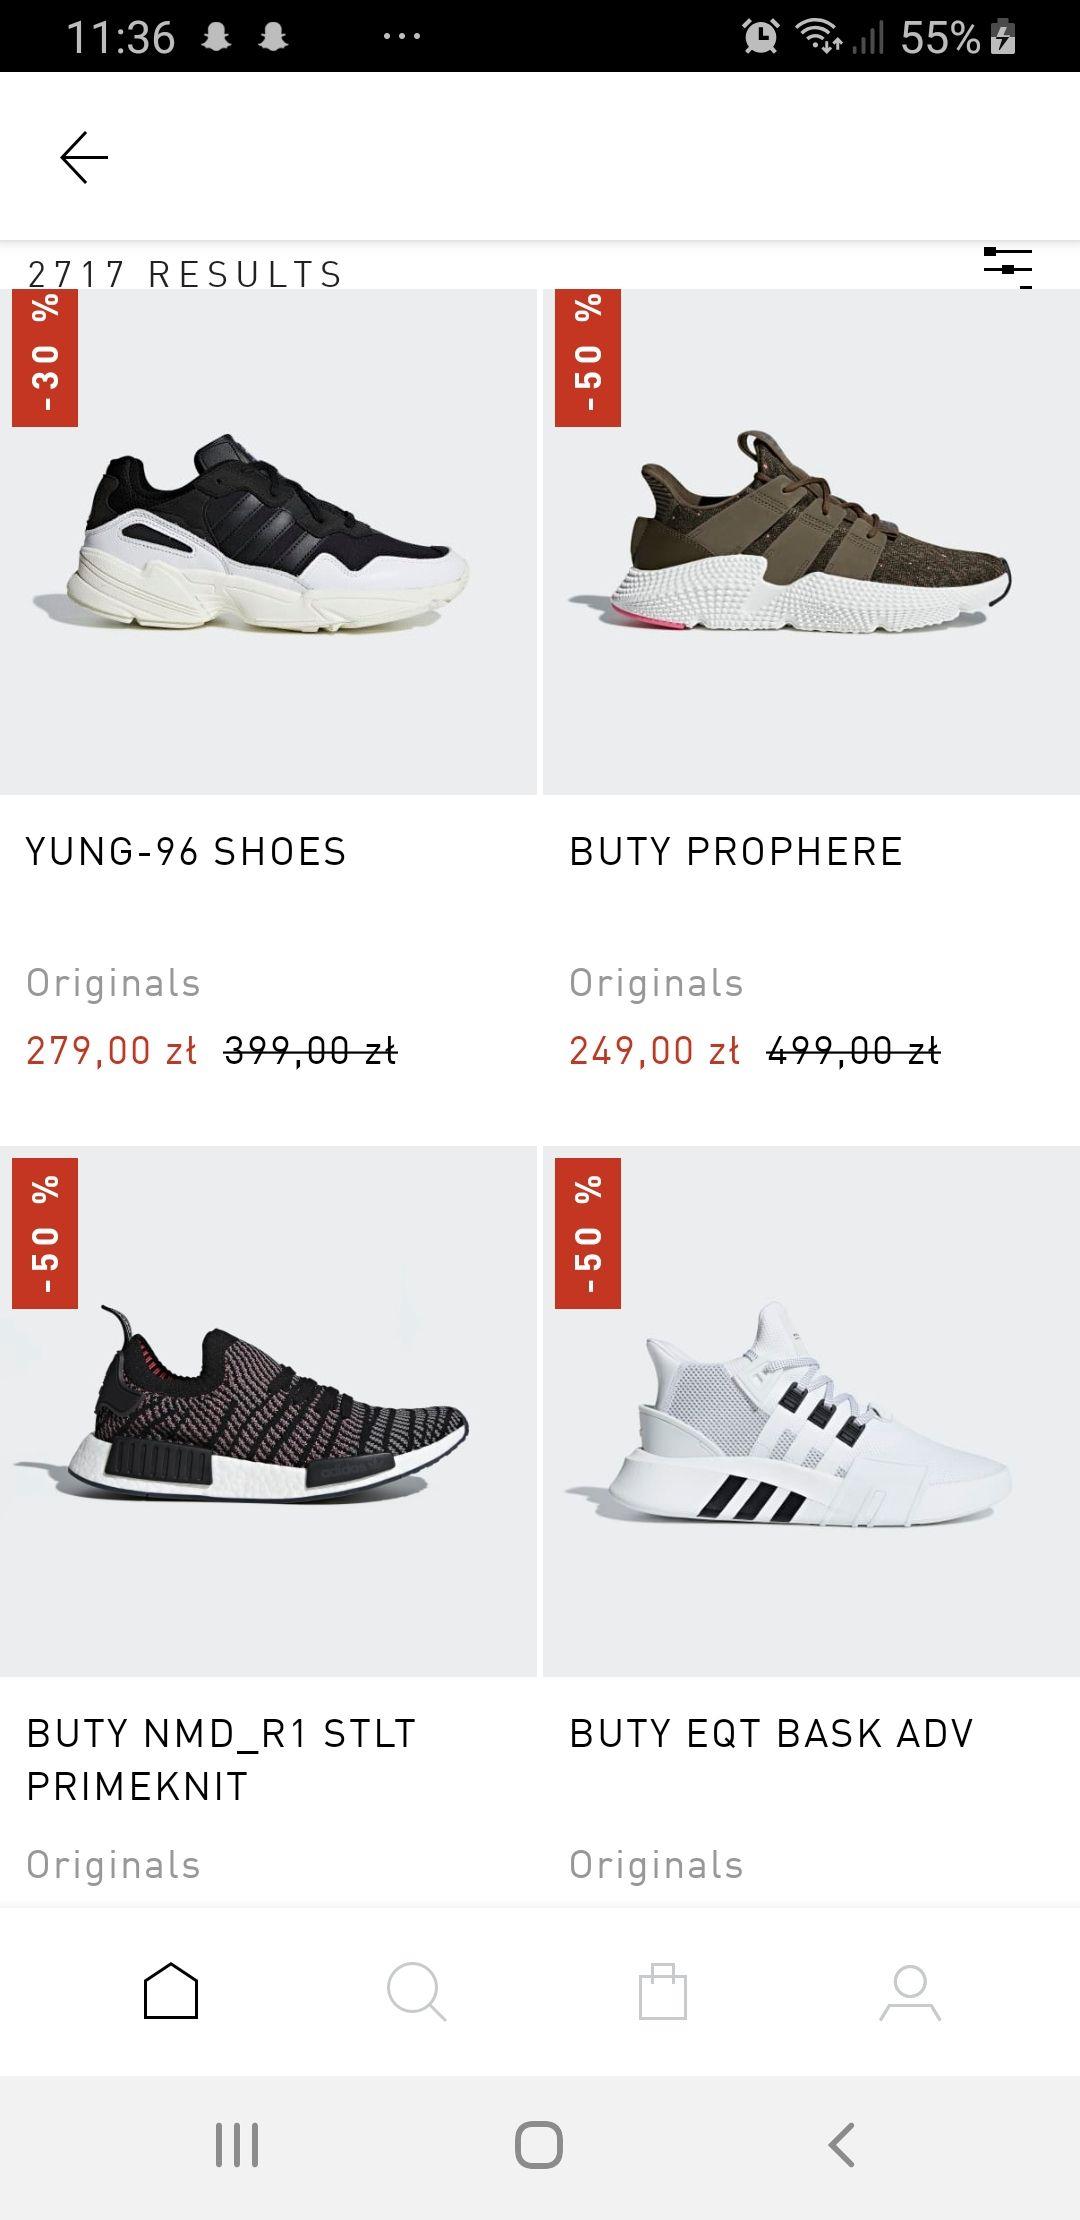 Buty Adidas -50%